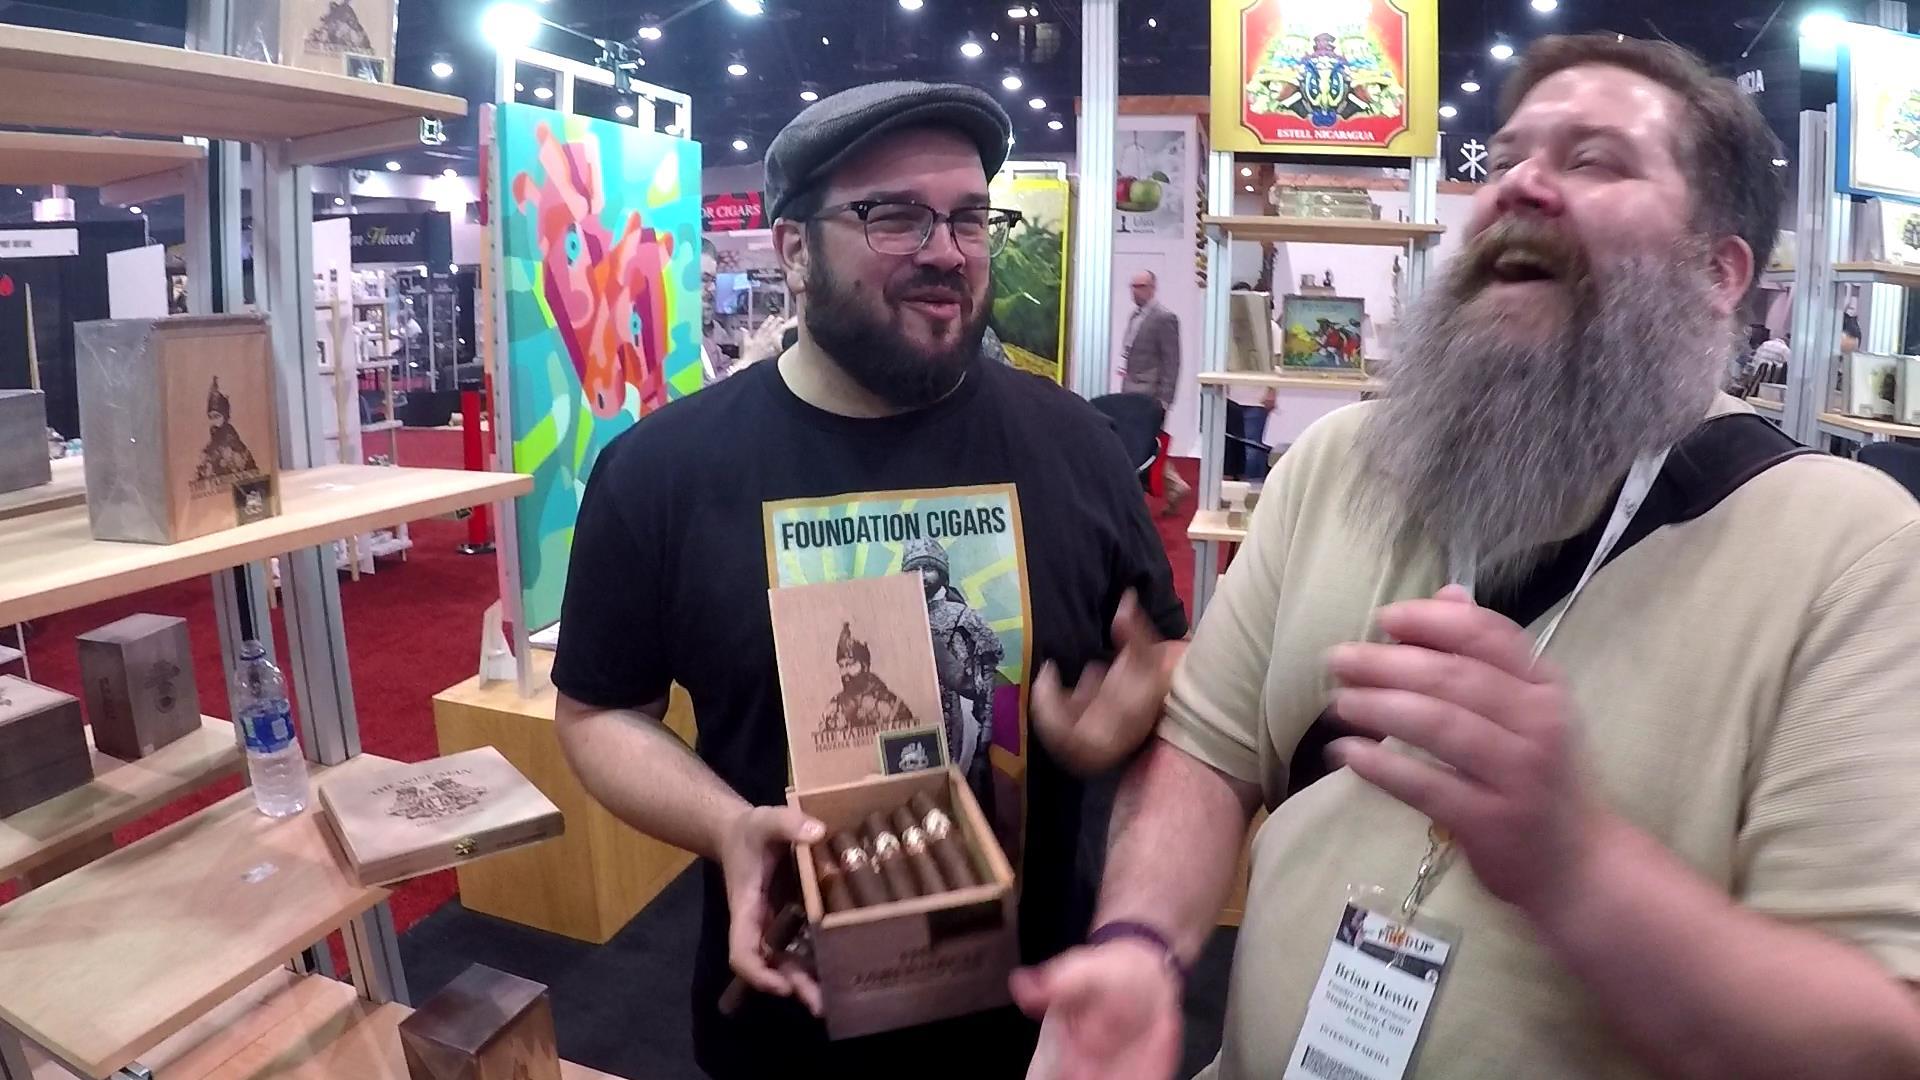 IPCPR 2018: Foundation Cigars